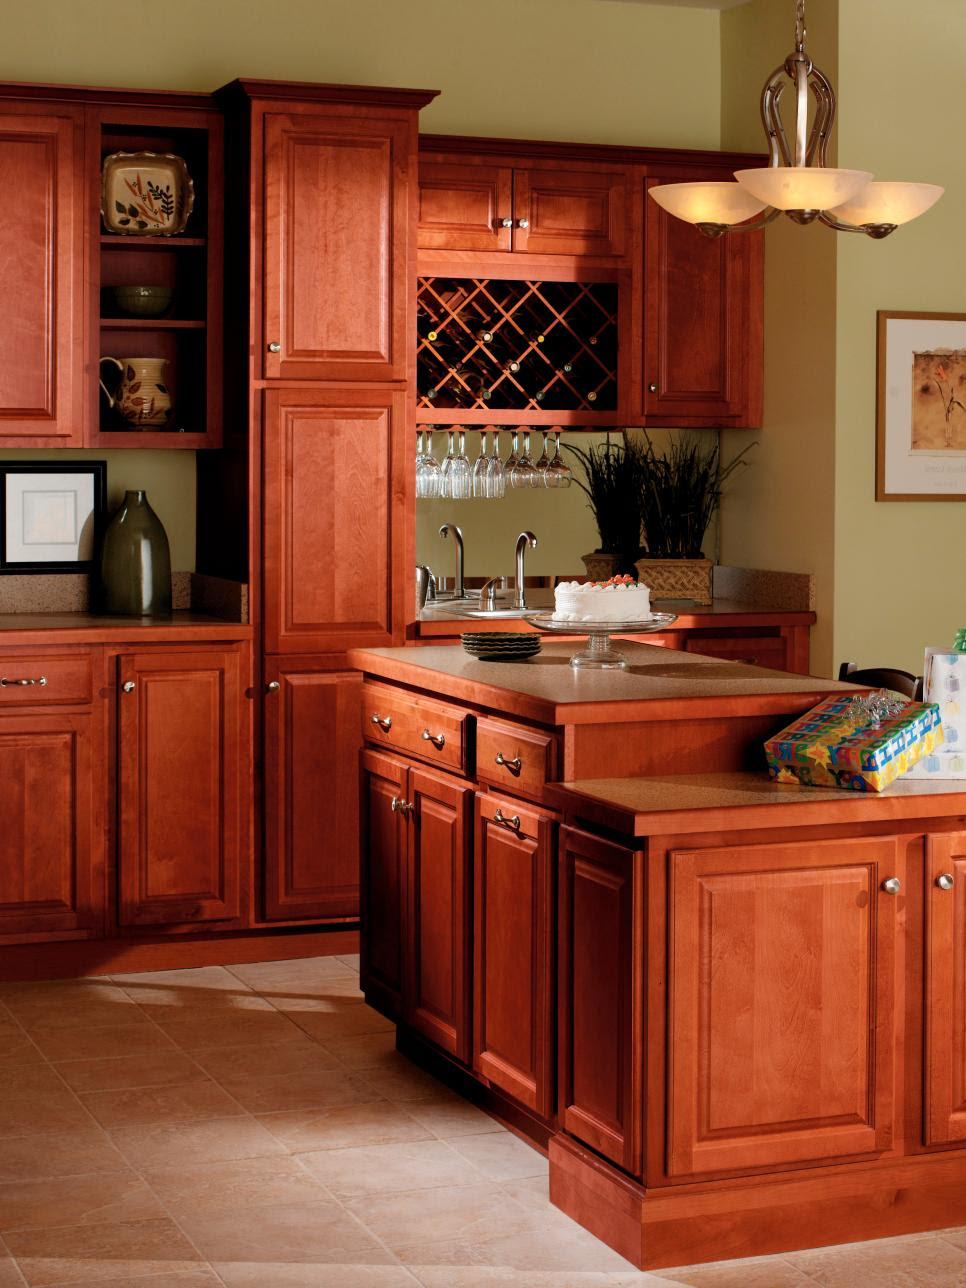 Quartz Kitchen Countertops: Pictures & Ideas From HGTV   HGTV